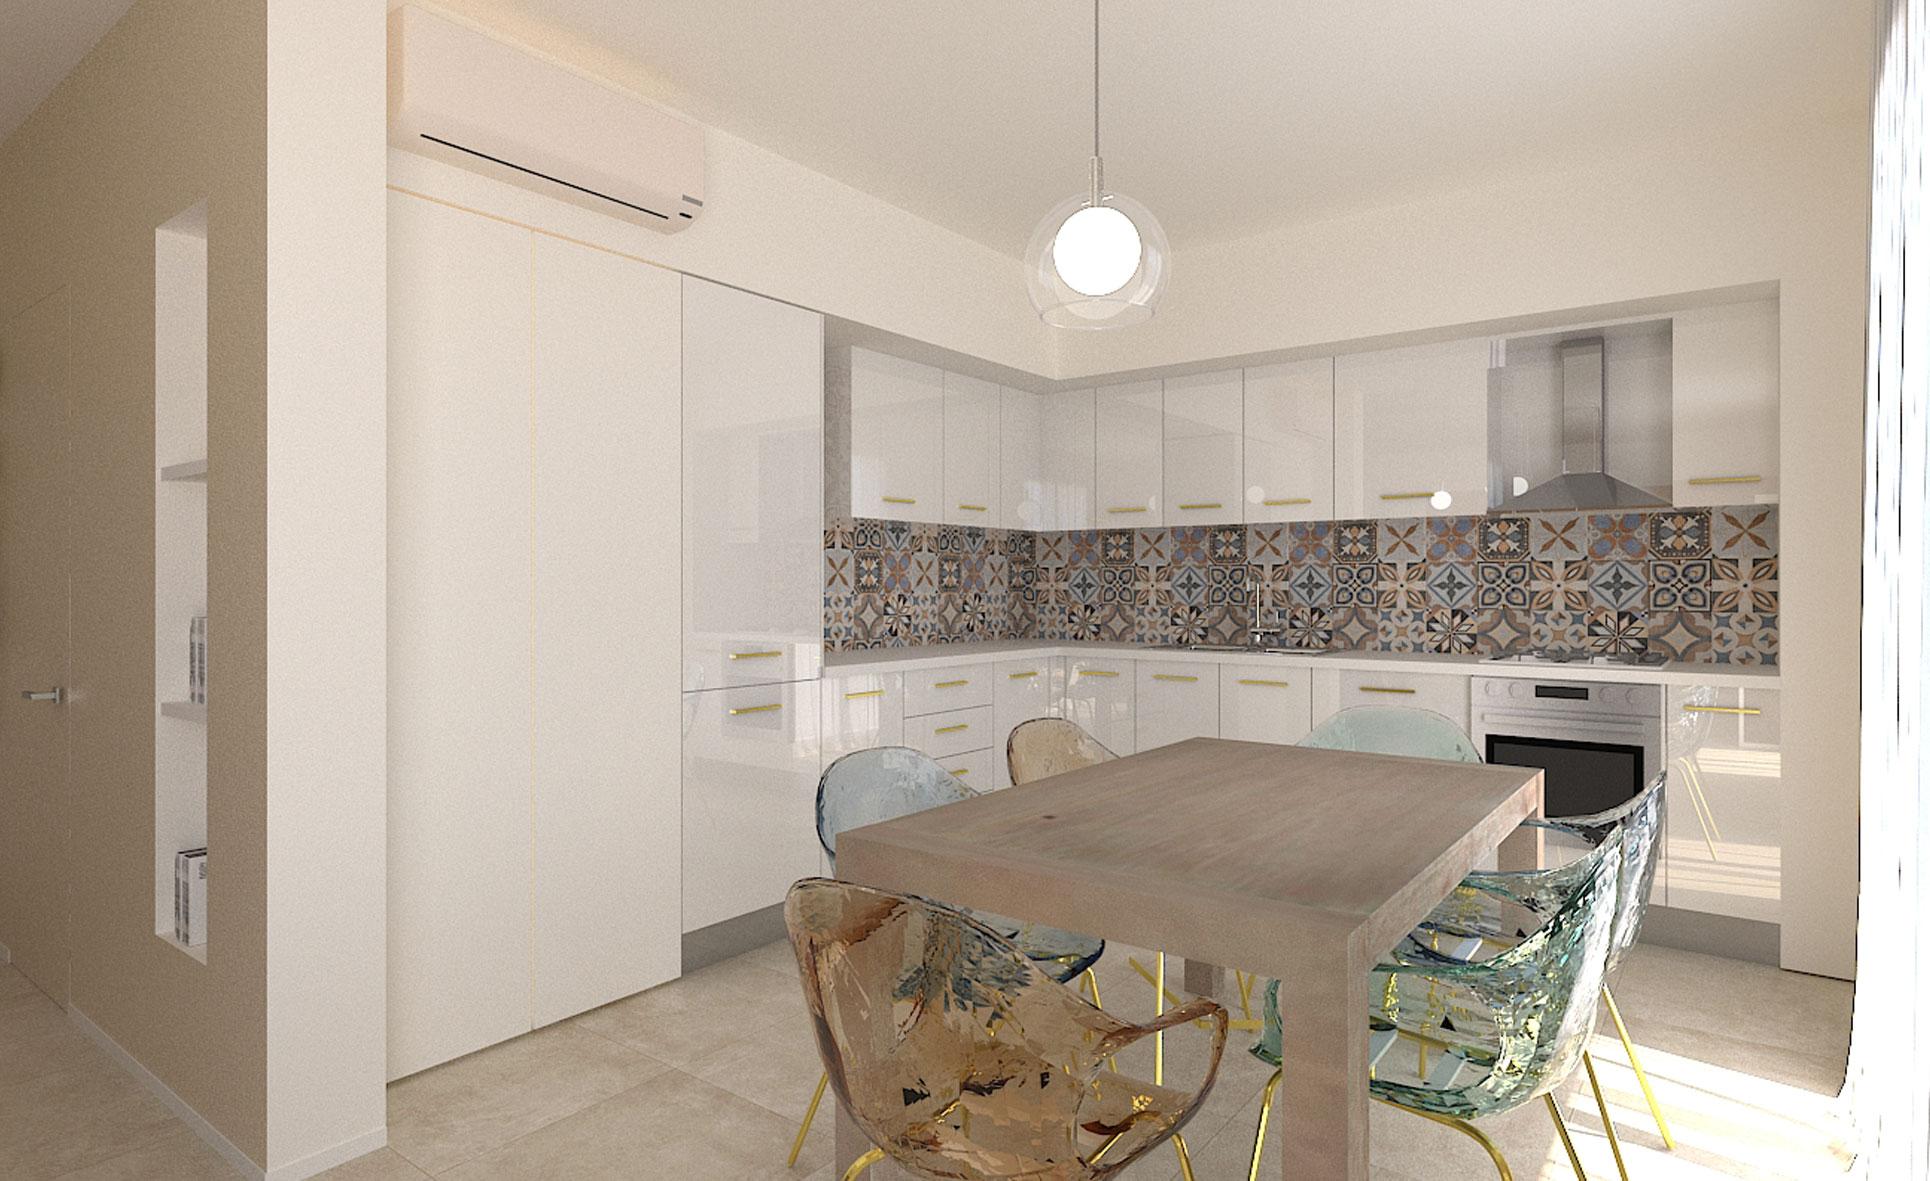 interni-interior-arredamento-arredo-cucina